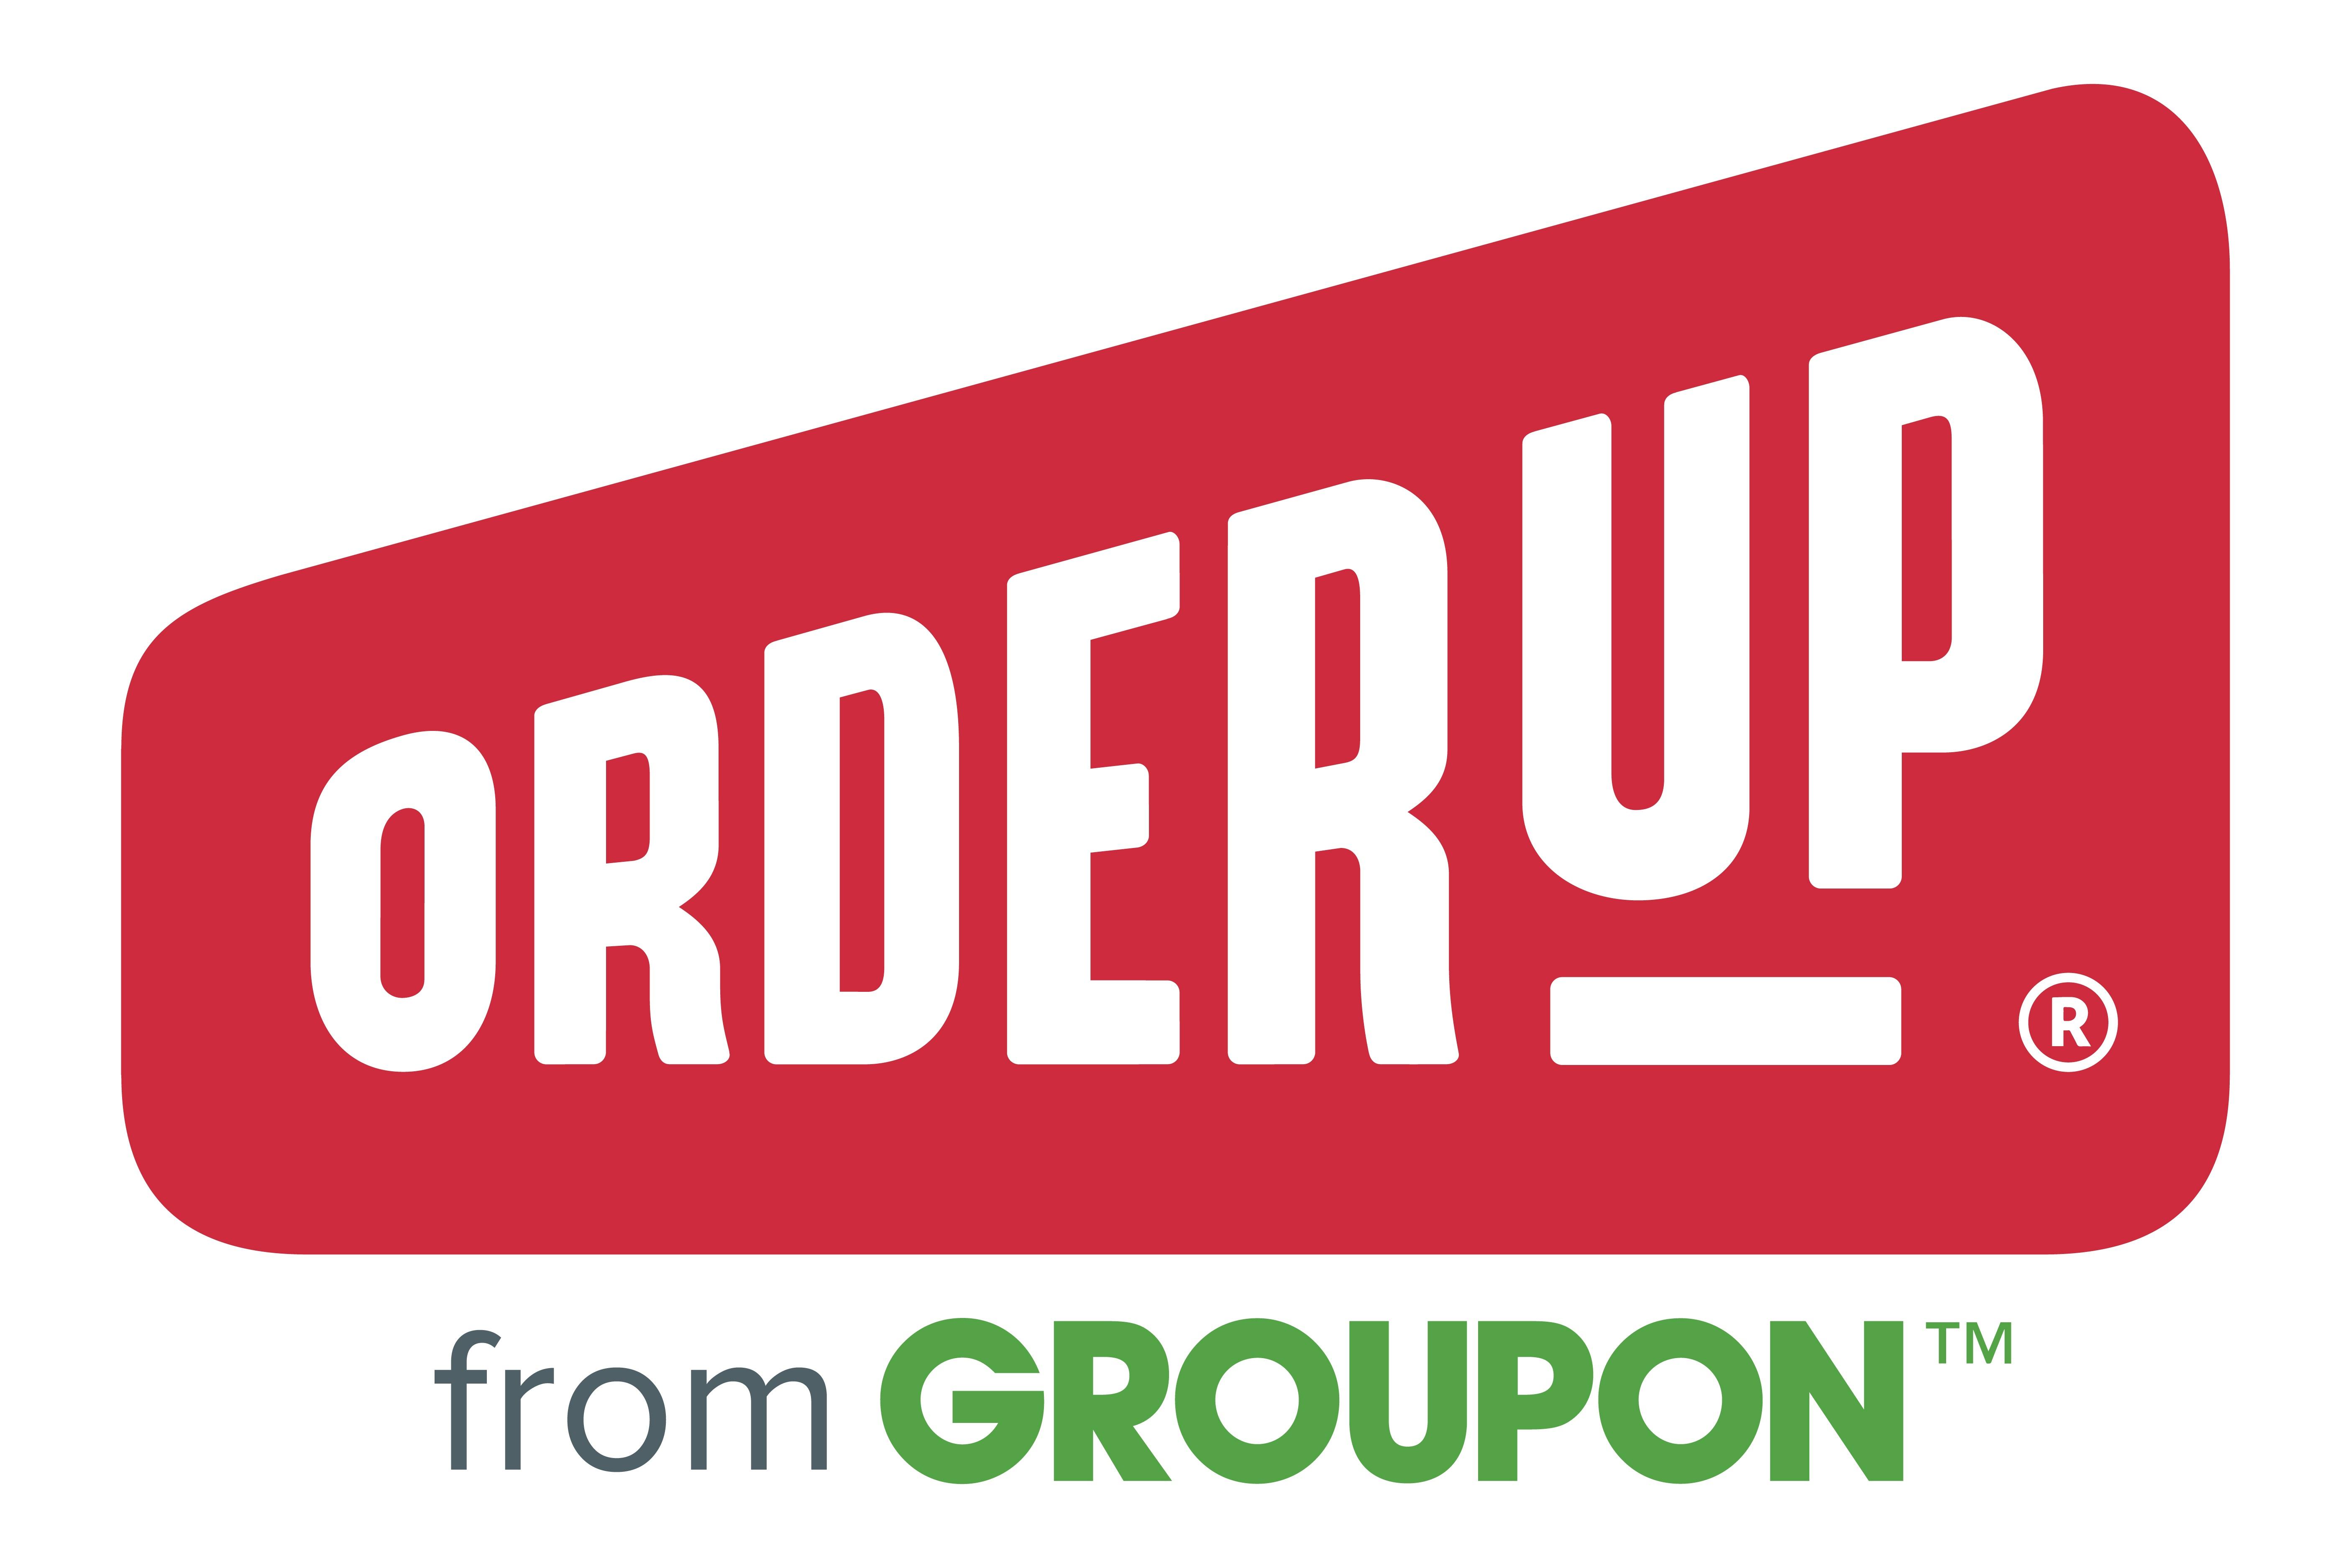 OrderUp-From-Groupon-Logos_RedGreen-Registered.jpg